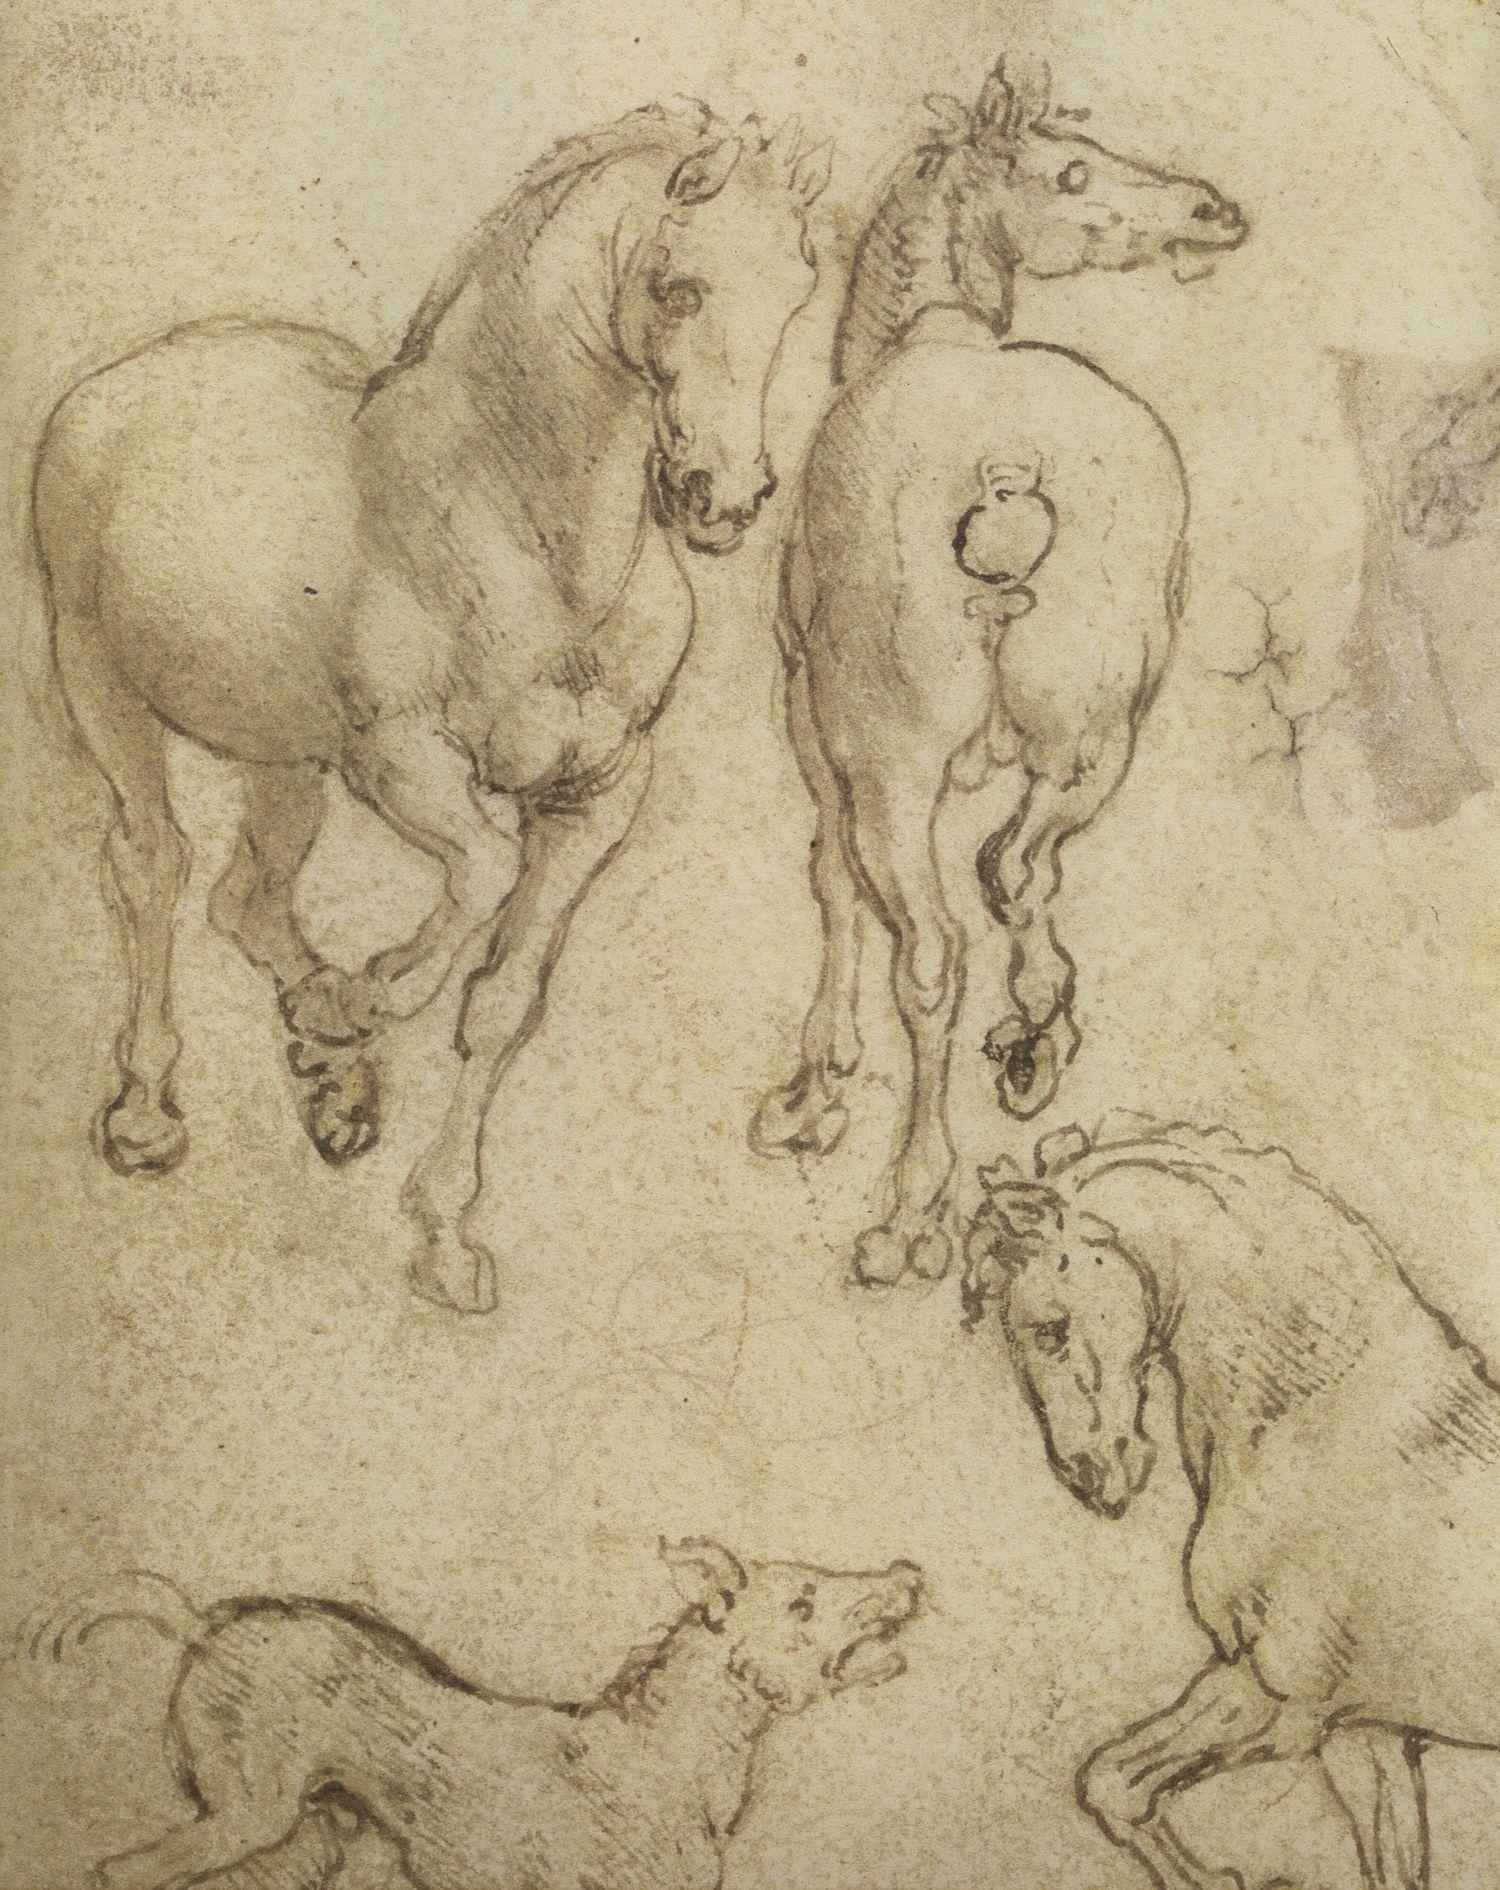 Leonardo-da-Vinci---Drawings---Animals--Horses 1.jpg   Horse drawings,  Animal drawings, Horse painting